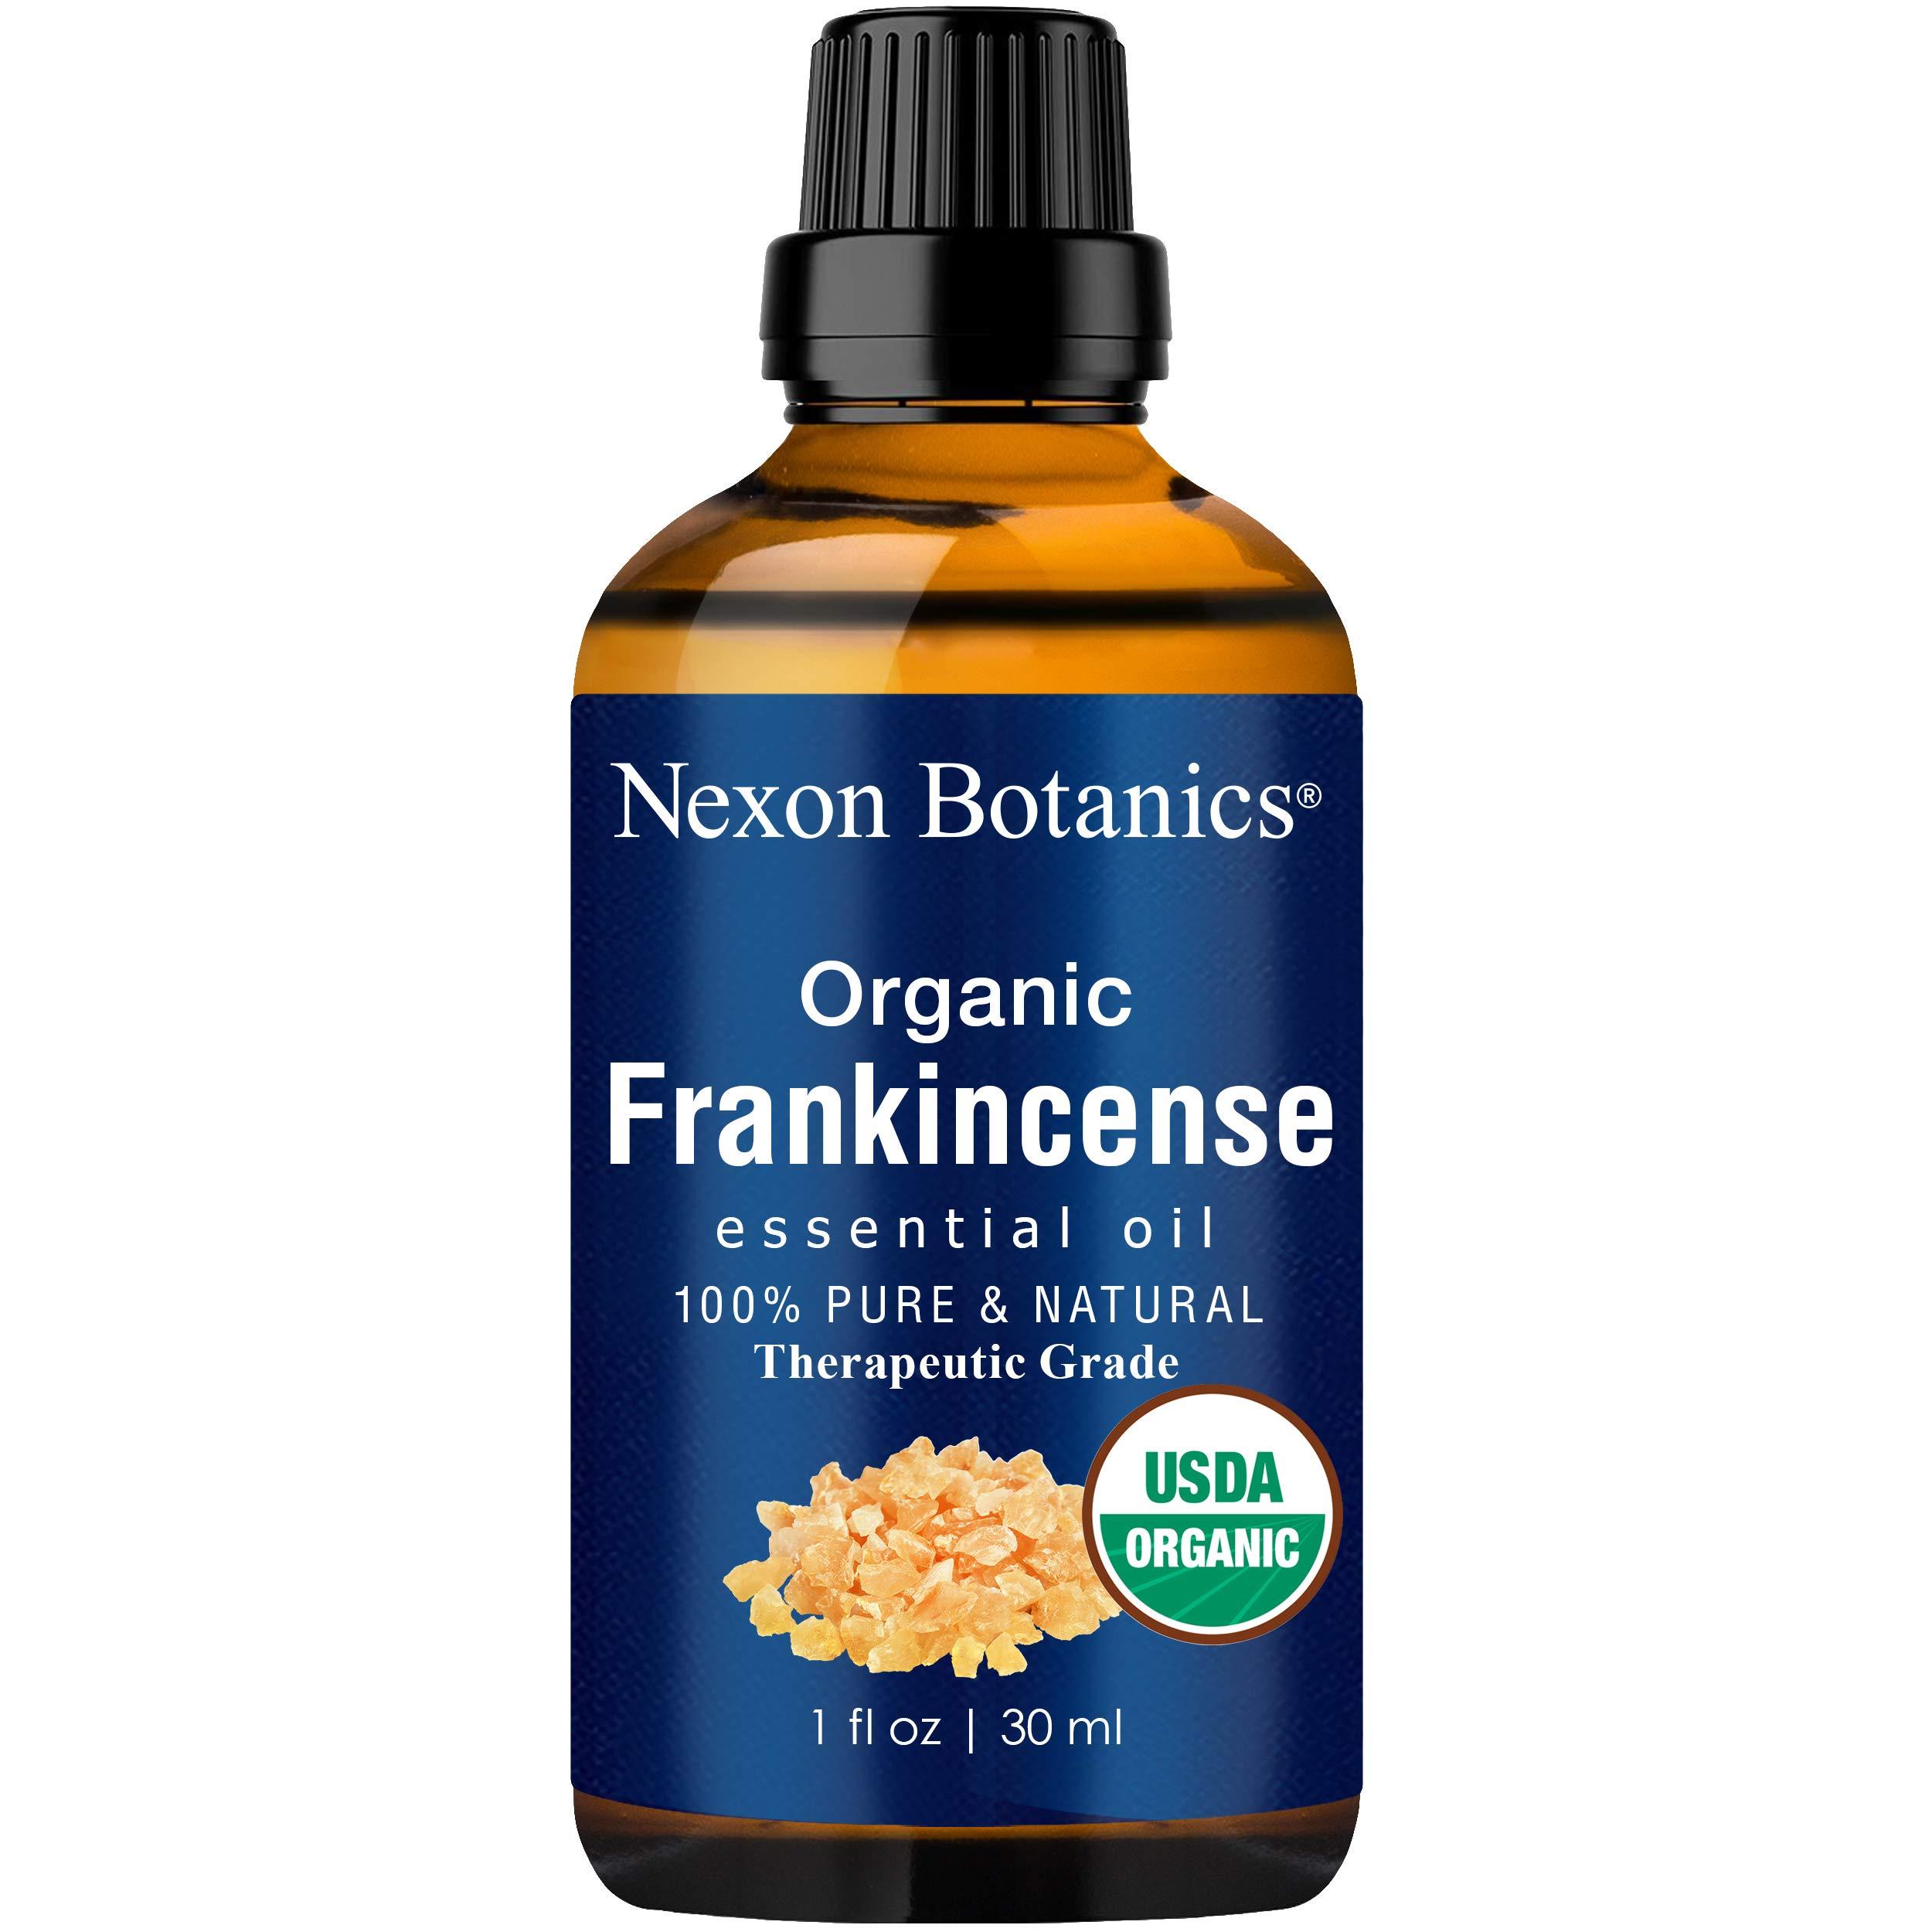 Nexon Botanics Organic Frankincense Essential Oil 30 ml - USDA Certified Frankincense Oil Organic - Pure, Natural Frankensence Essential Oil for Diffuser and Aromatherapy by Nexon Botanics